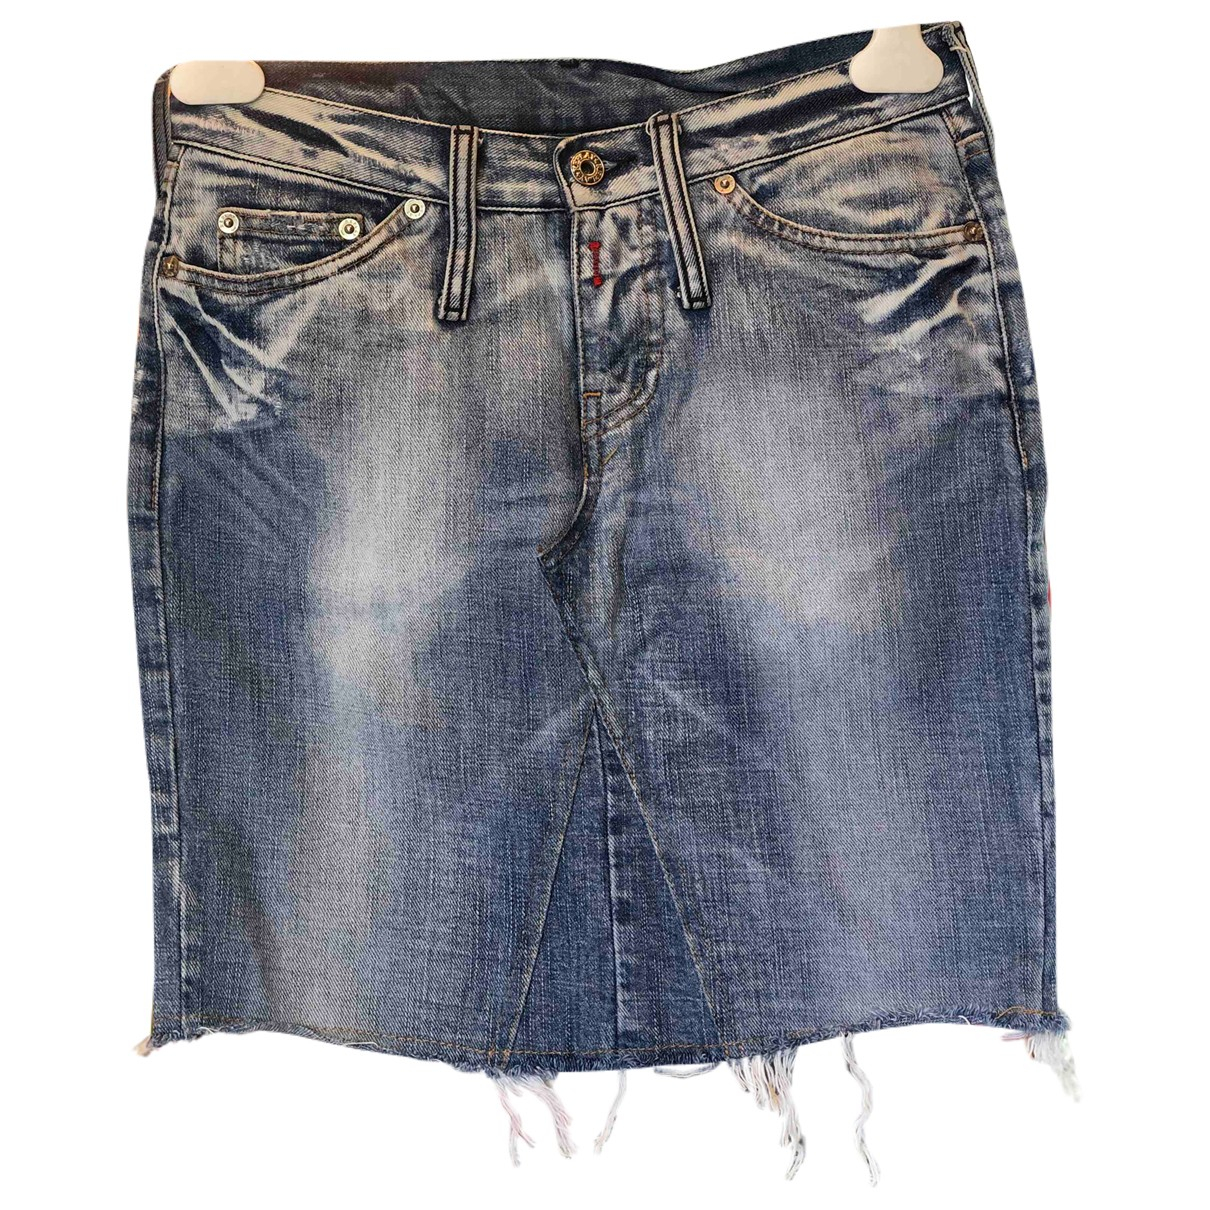 Replay \N Denim - Jeans skirt for Women 40 IT